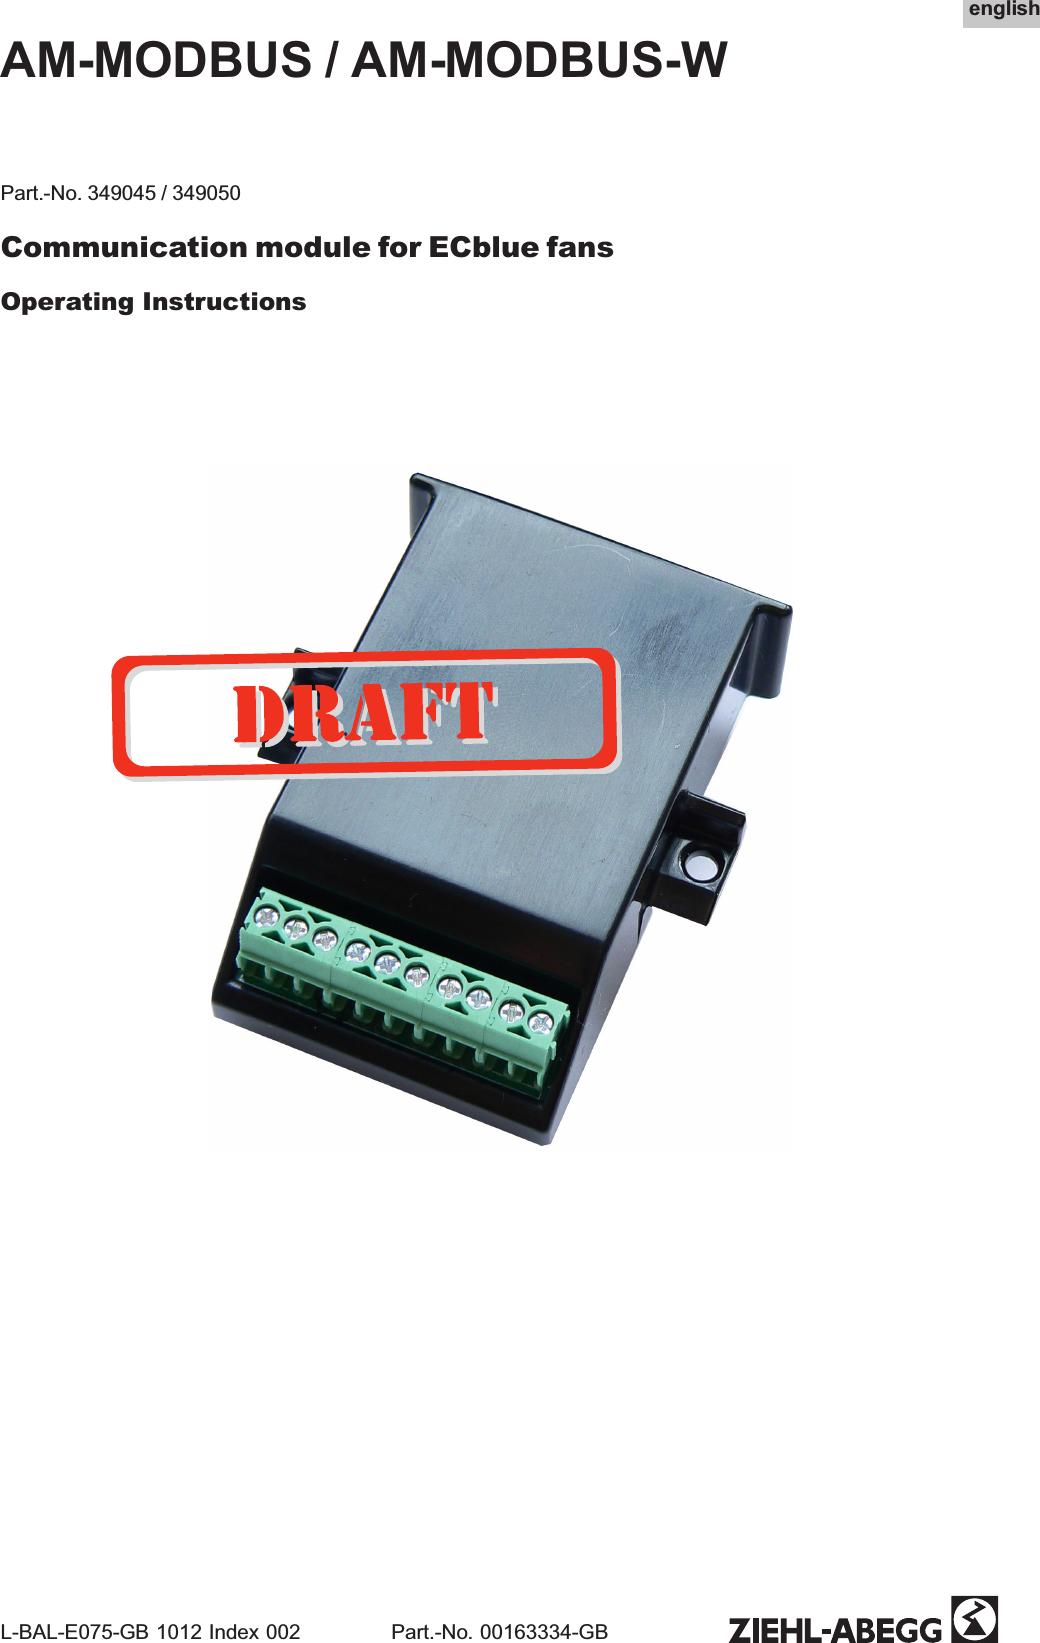 [ZHKZ_3066]  Ziehl Abegg SE AMMODBUSW RF Module AM-MODBUS(-W) User Manual | Ziehl Abegg Motor Wiring Diagram |  | UserManual.wiki